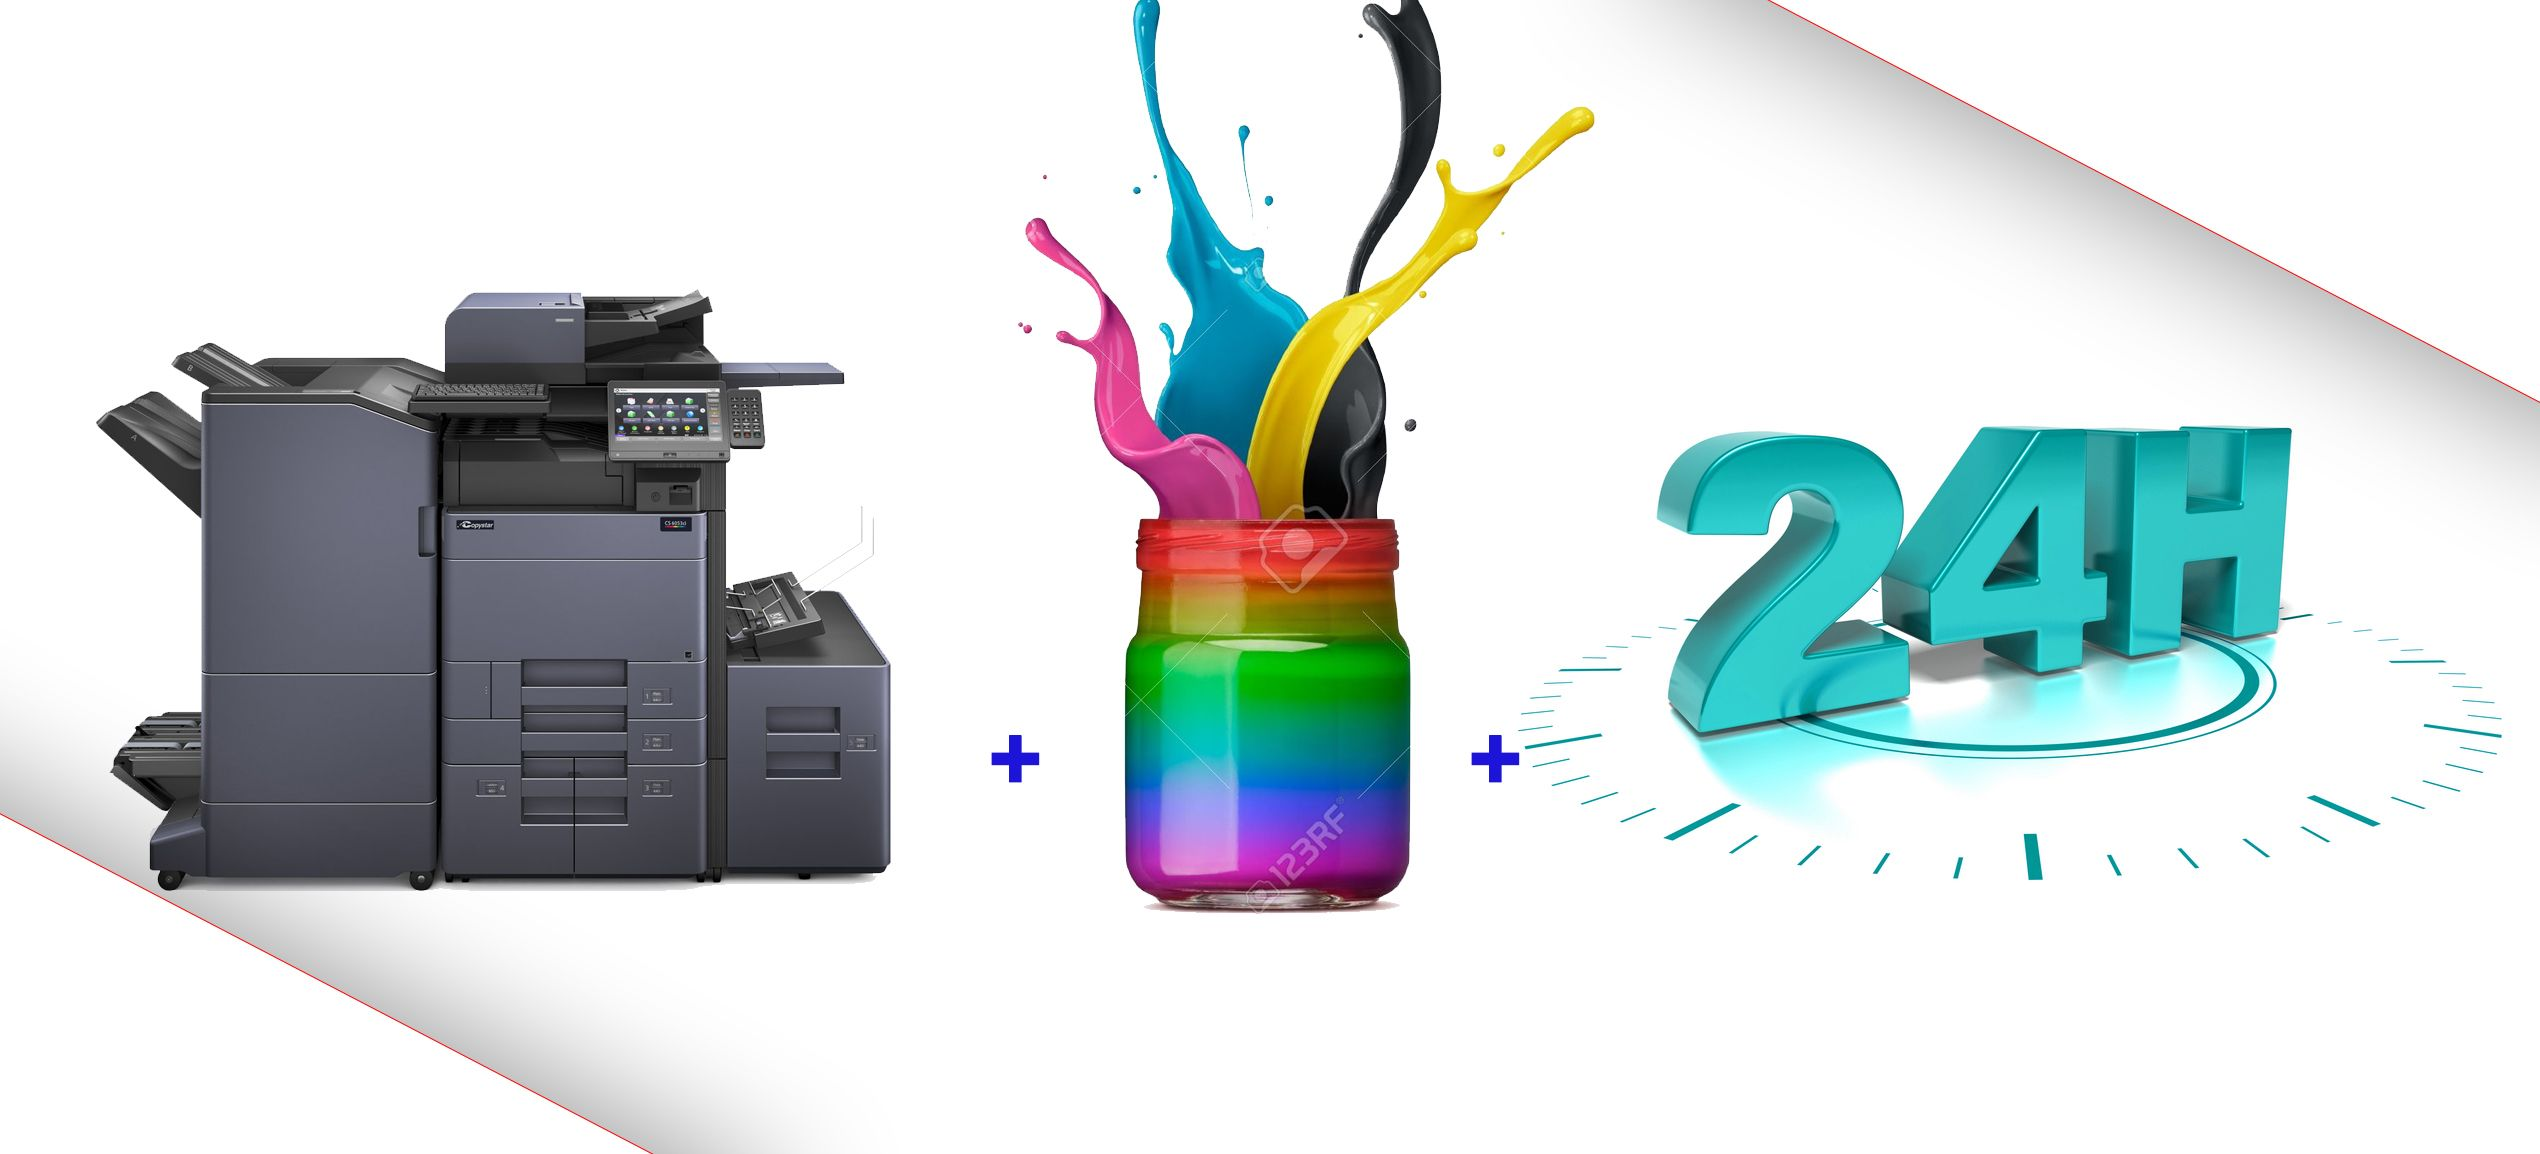 24 Hours Cheap Color Copies Cheap printing, Color copies